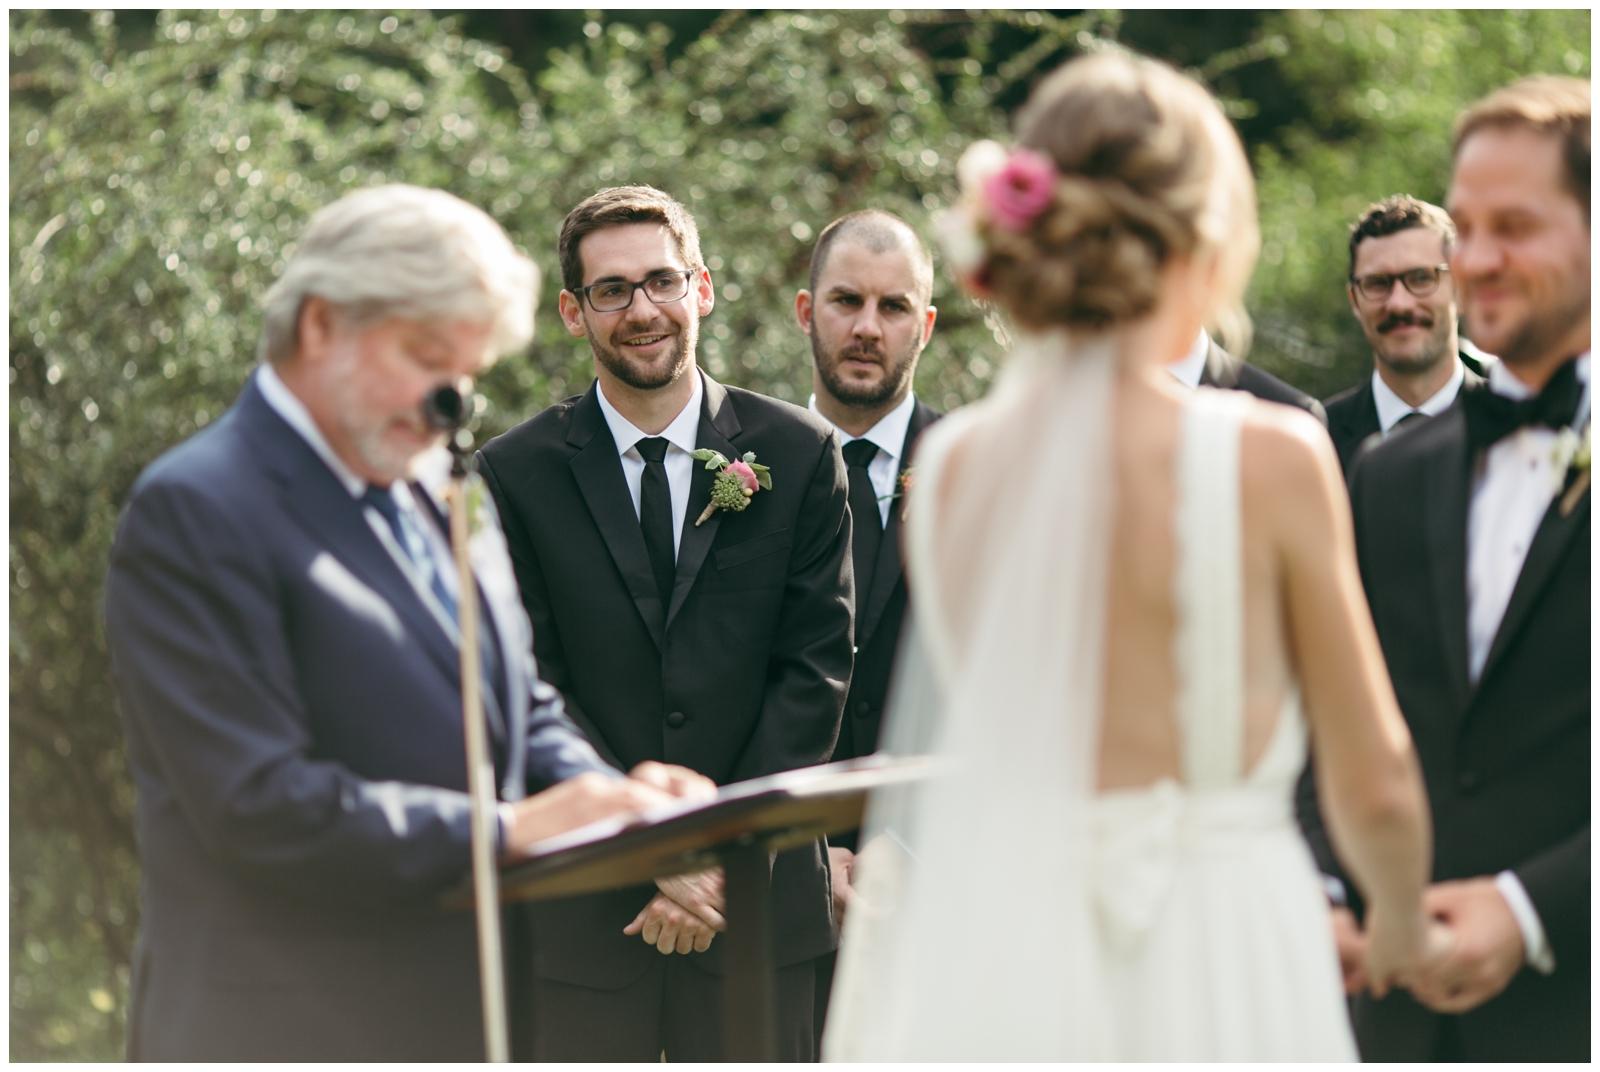 Moraine-Farm-wedding-Bailey-Q-Photo-Massachusetts-wedding-photpgrapher-067.jpg